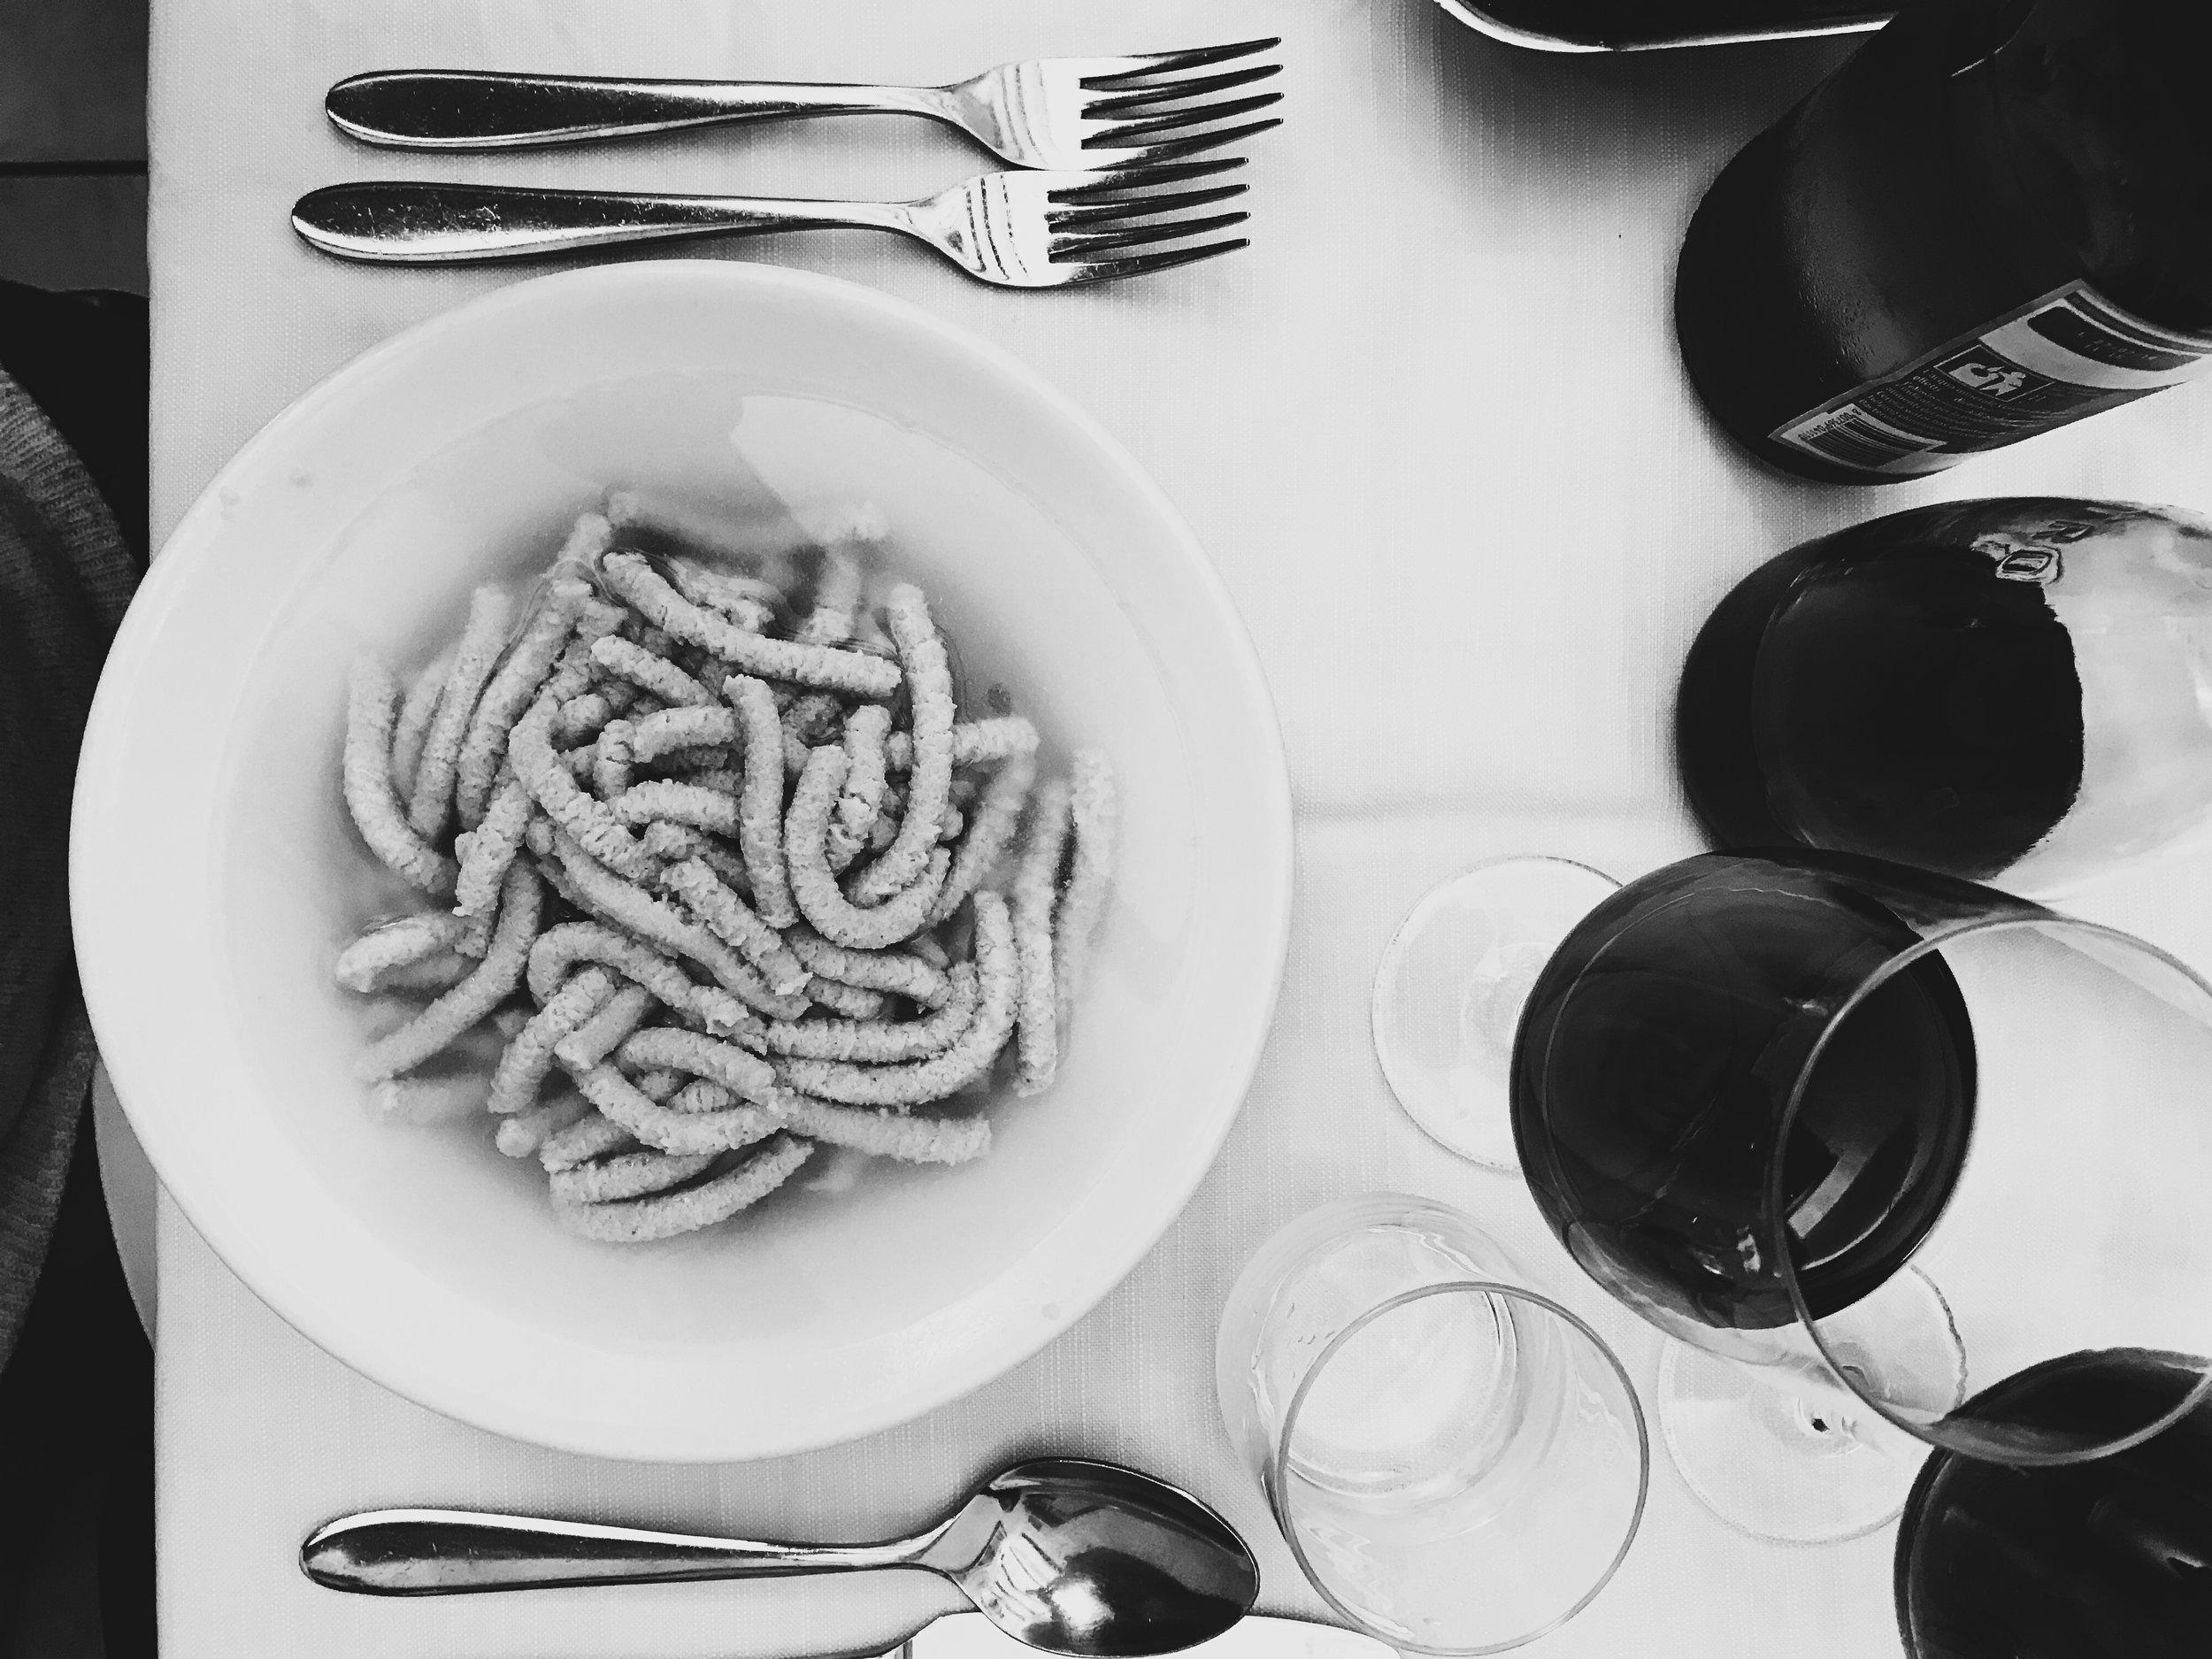 Looks funny, tastes DELICIOUS - local dish Pasatelli in Brodo